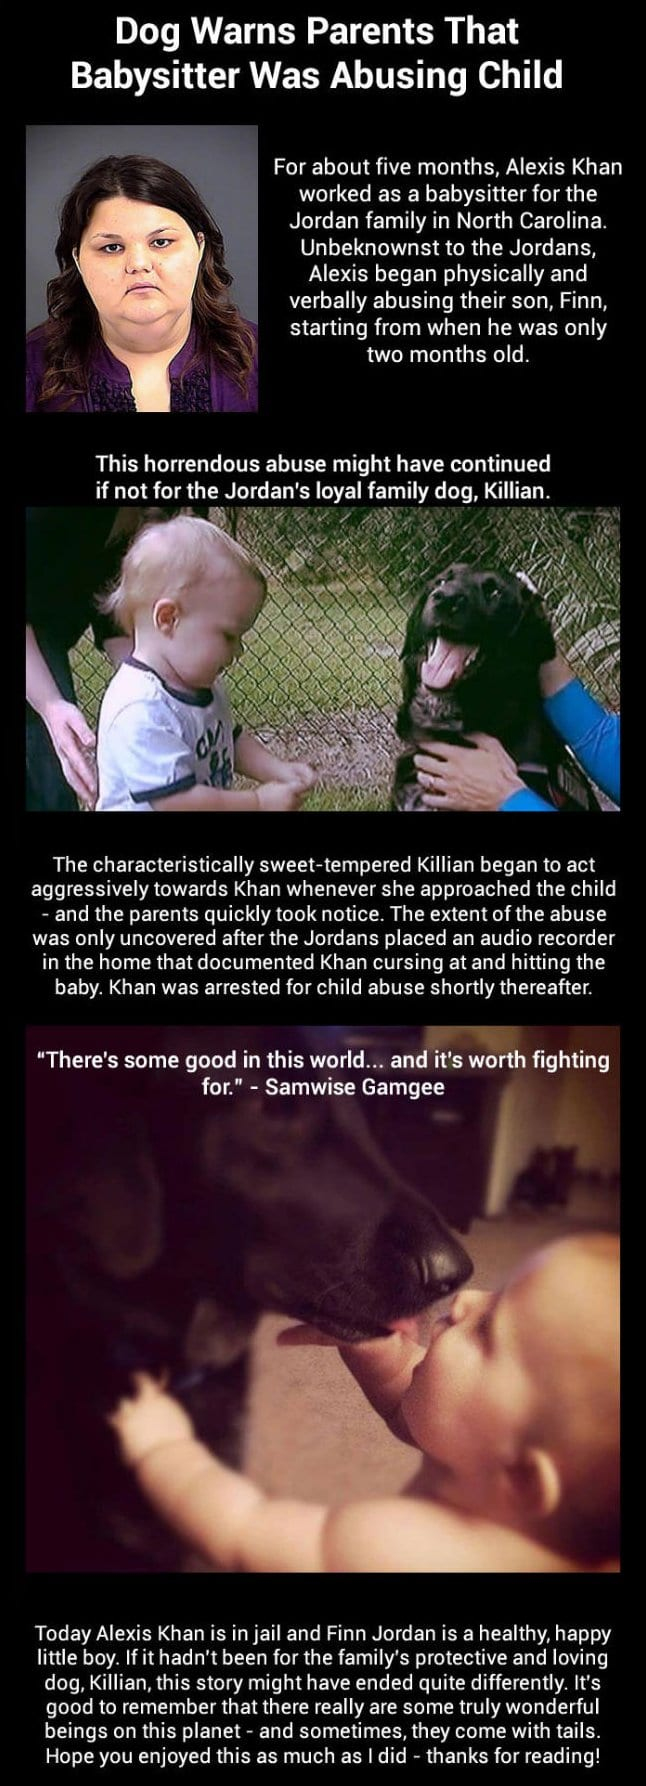 dog-warns-parents-babysitter-was-abusing-child